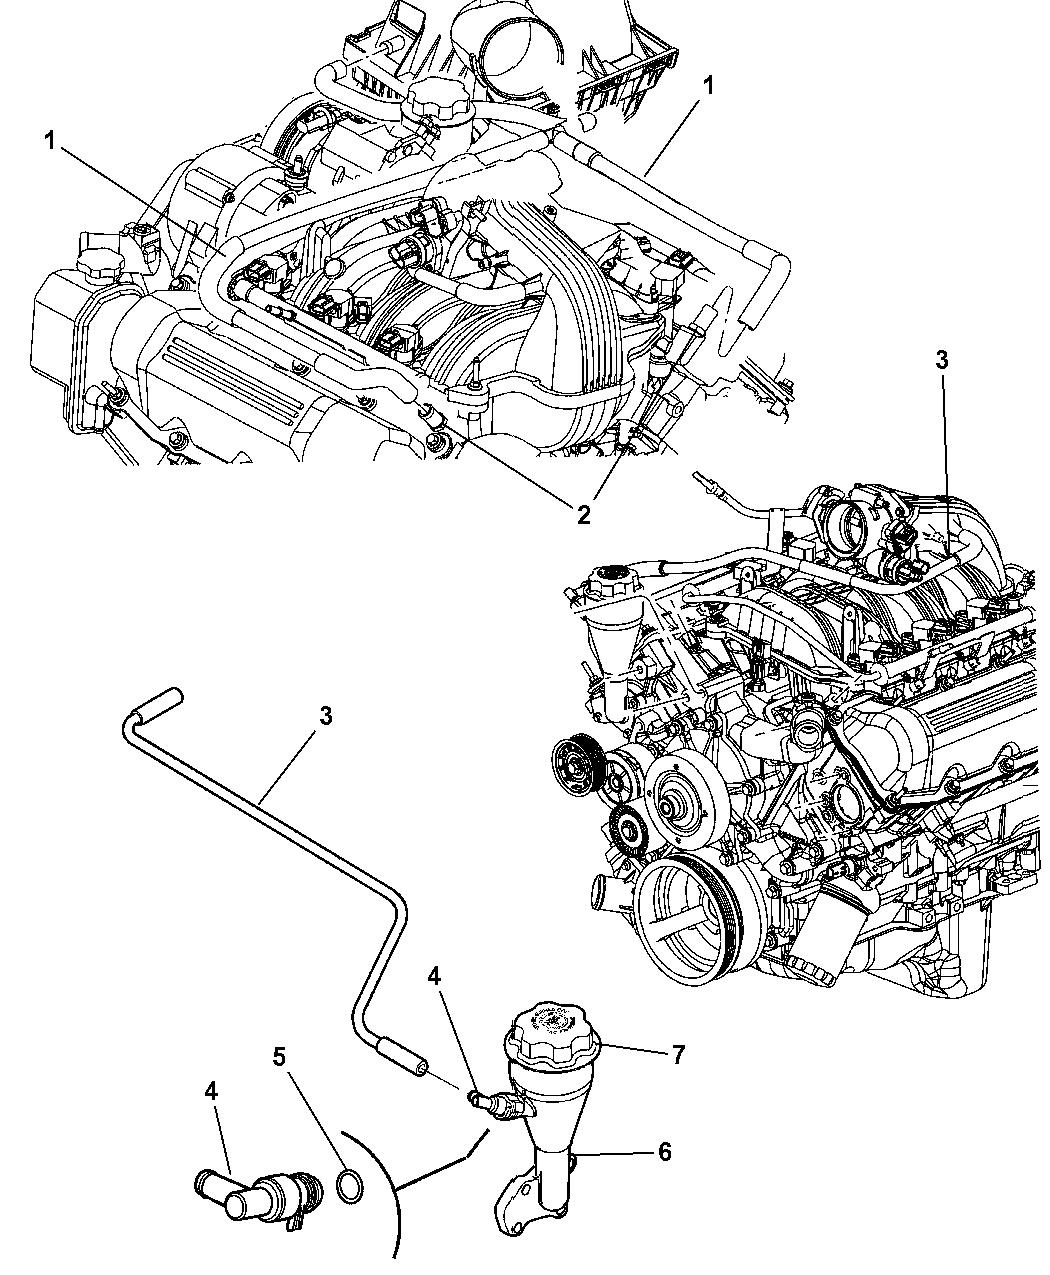 2006 Jeep Commander Crankcase Ventilation - Thumbnail 2